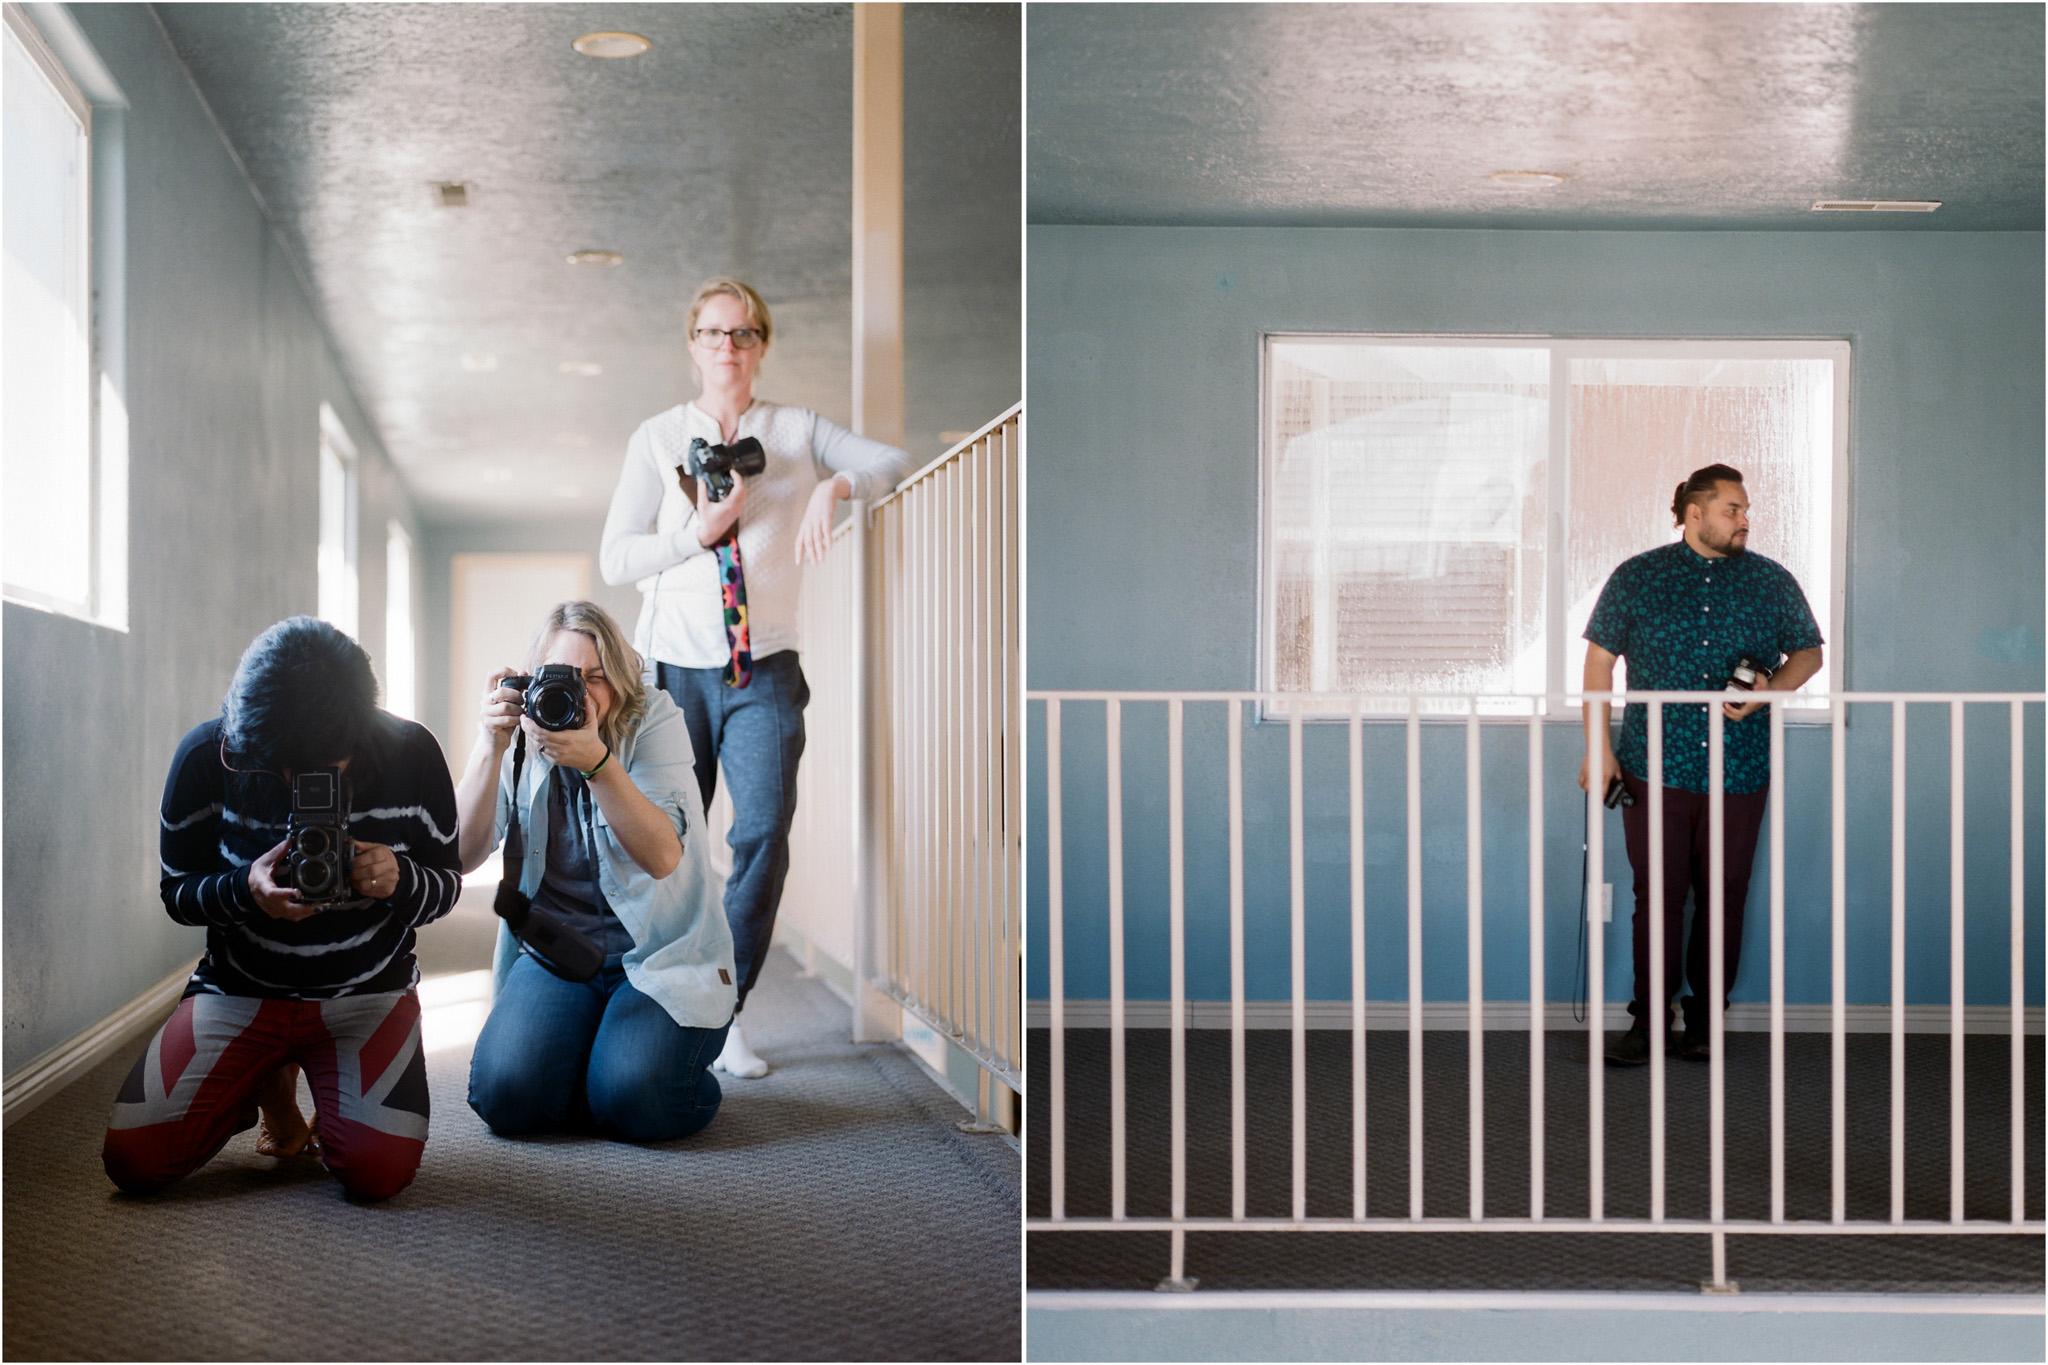 FILMSchoolBlog-12.jpg